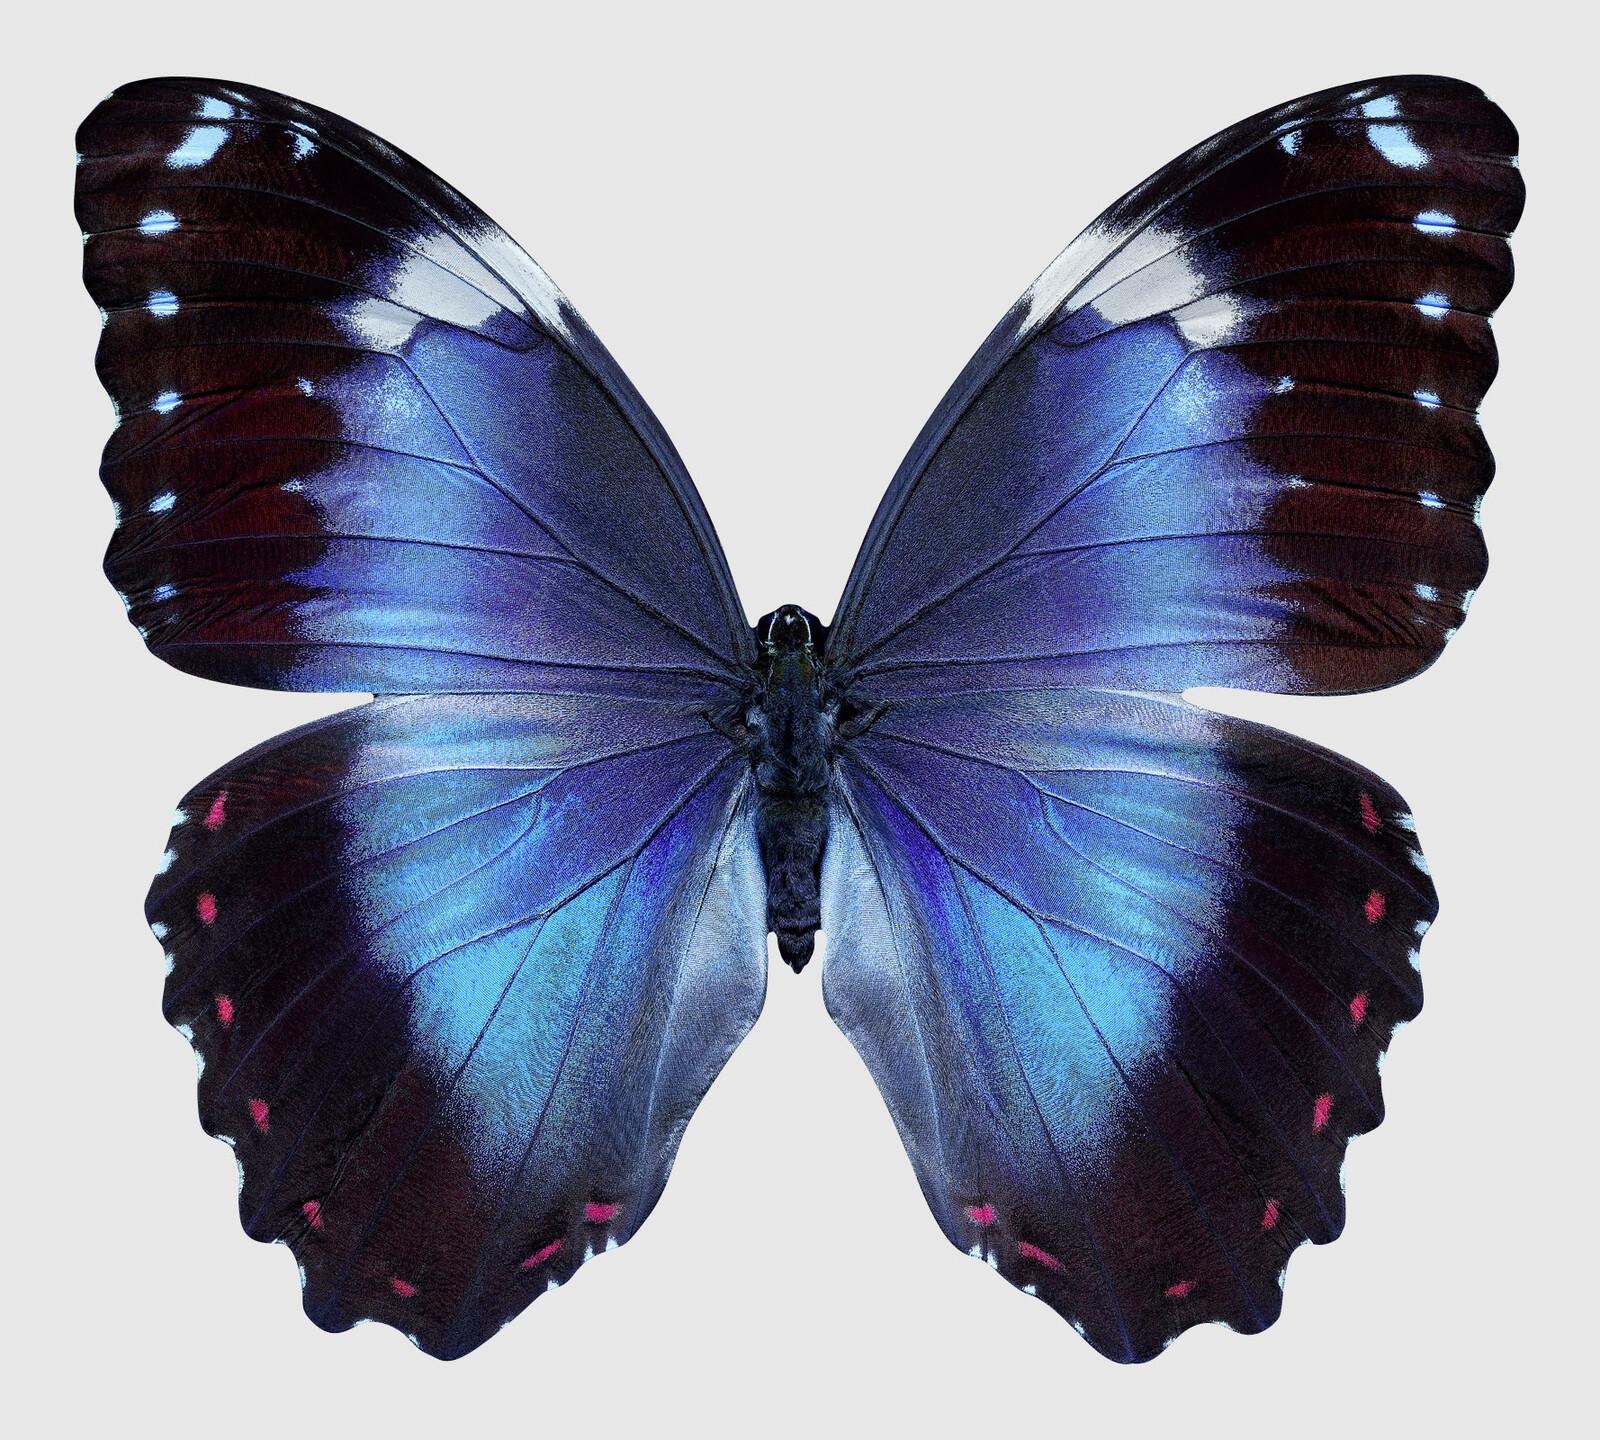 Butterfly XIV - Heiko Hellwig